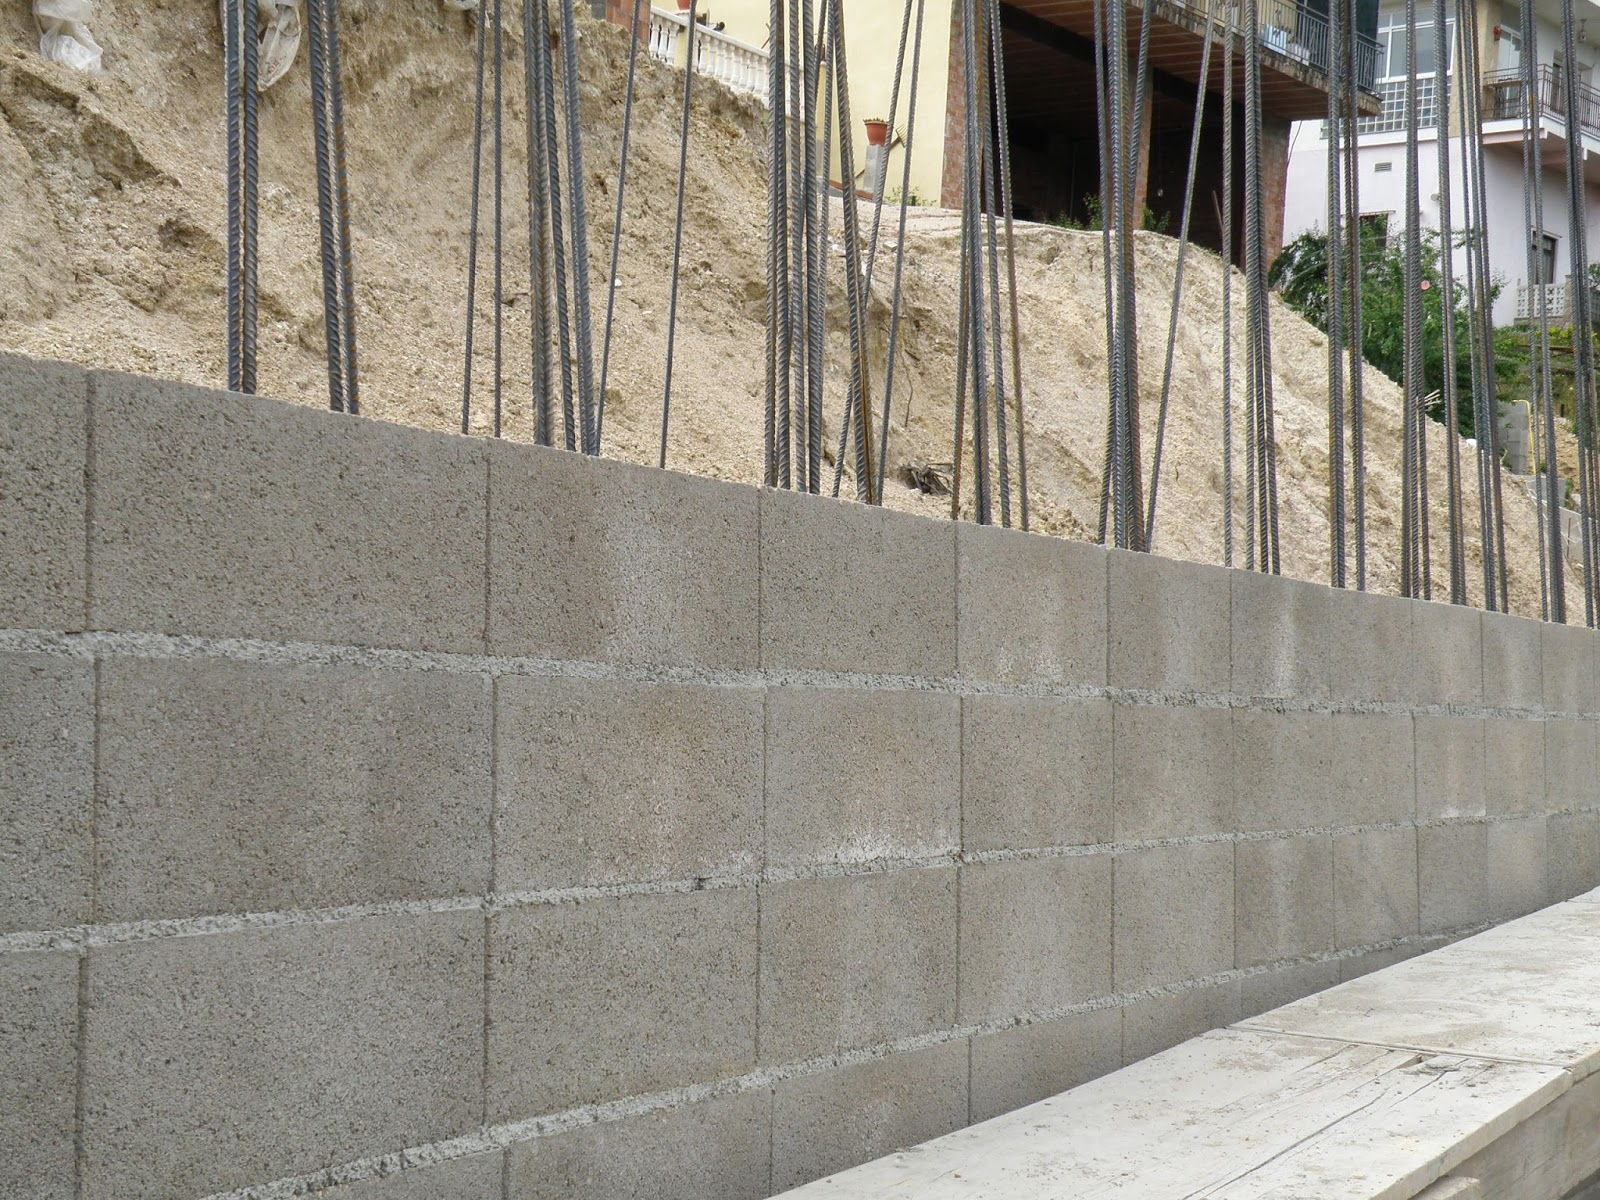 Remiendos anticrisis muro de bloques 230 euros m2 - Muro de bloques ...